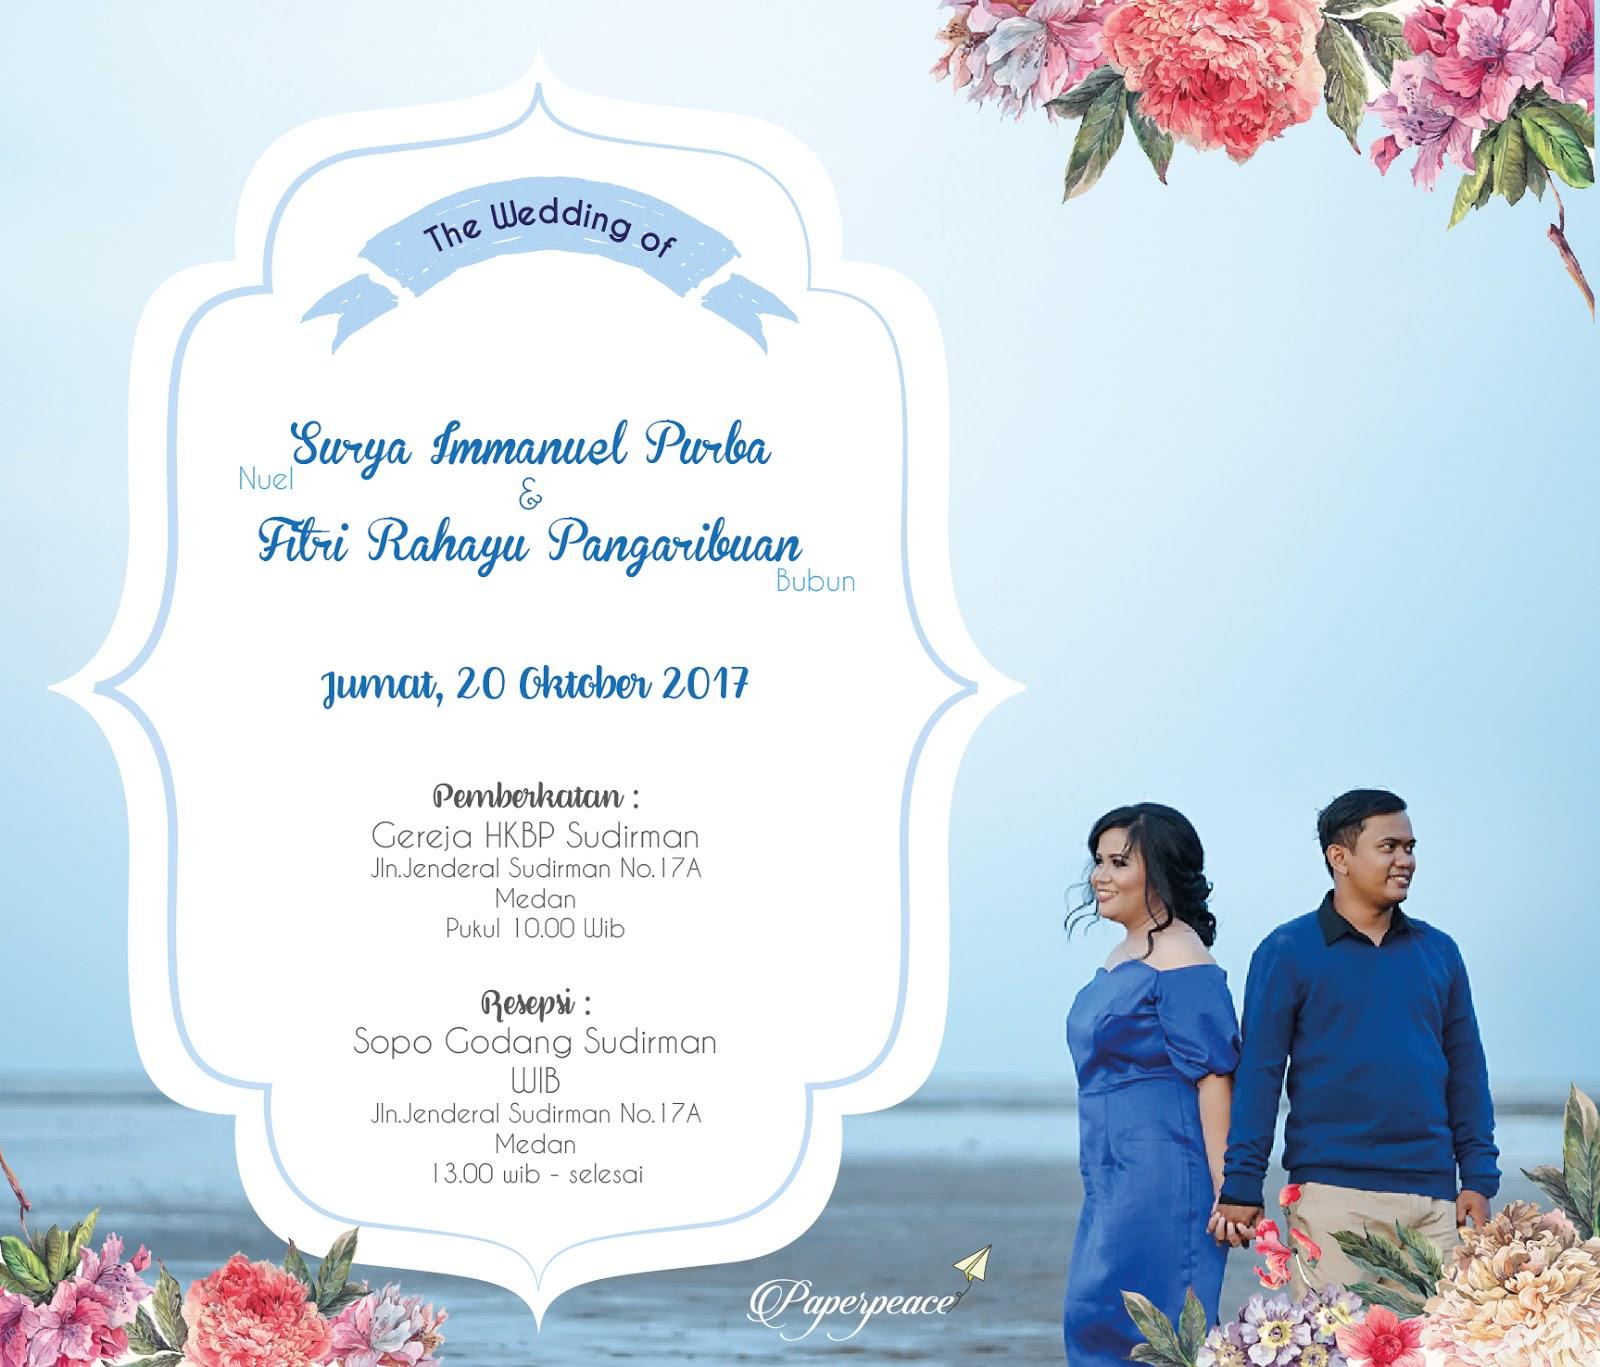 paperpeace: E invitation with pre wedding photo for mr.Nuel & ms.Bubun